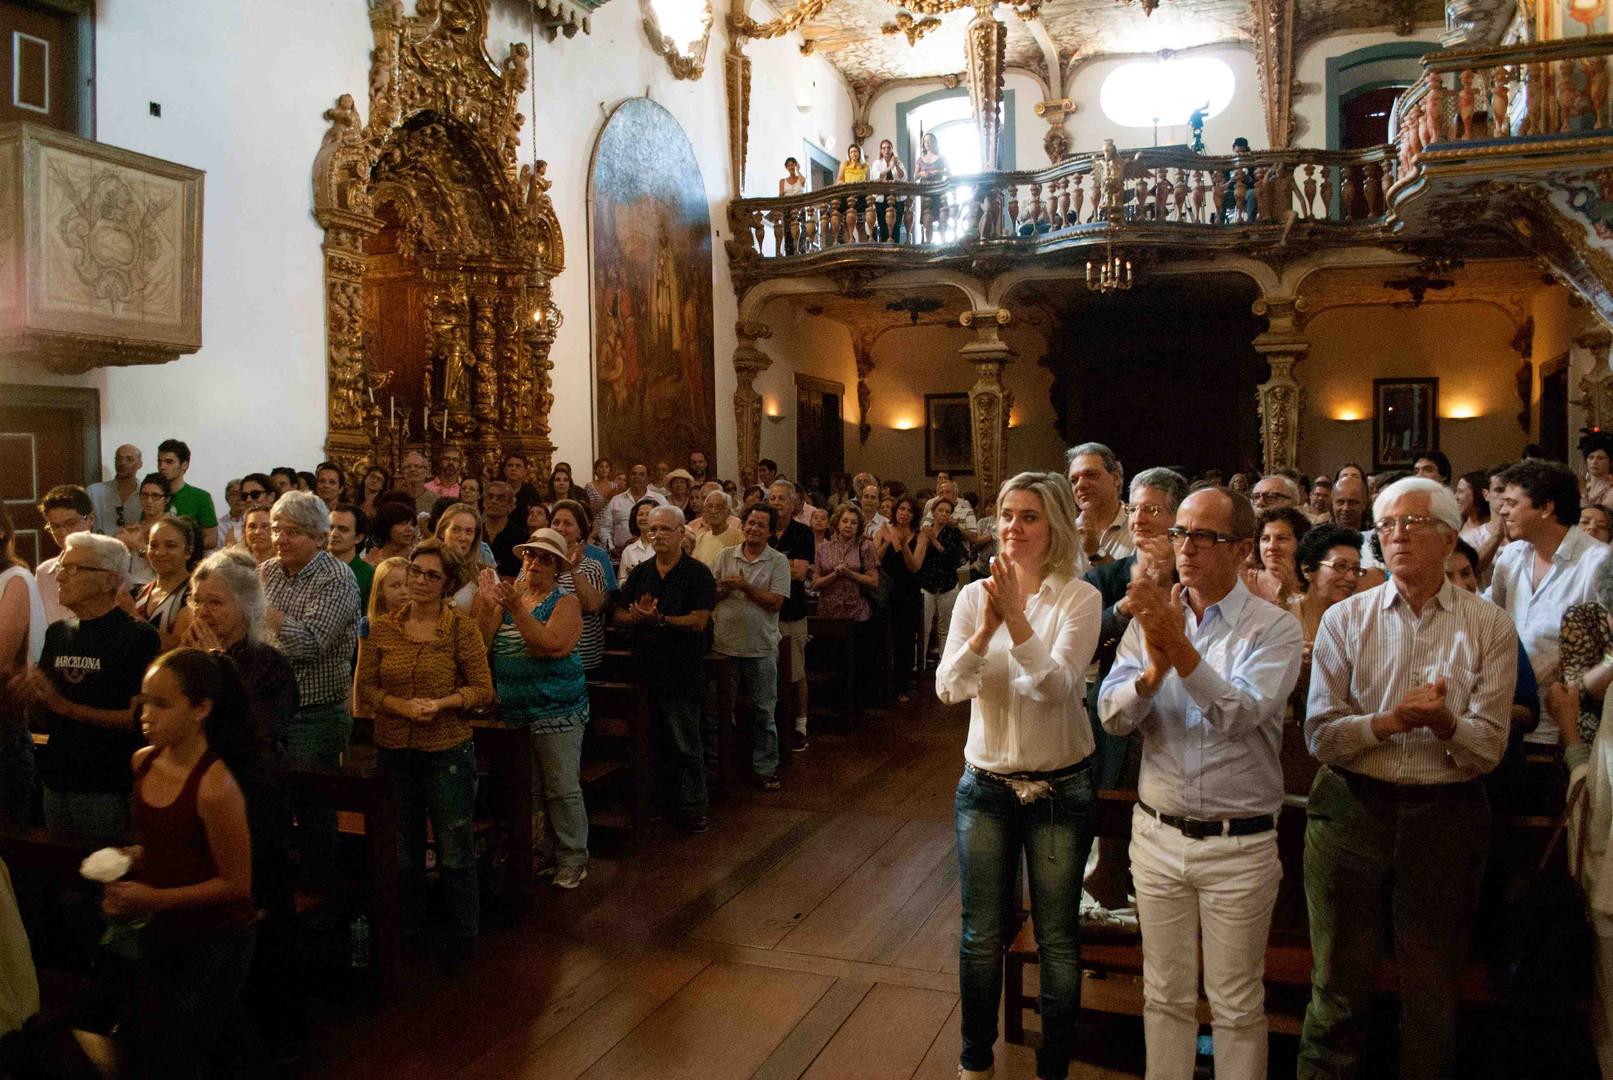 concerto de abertura_Nelson Freire (2012